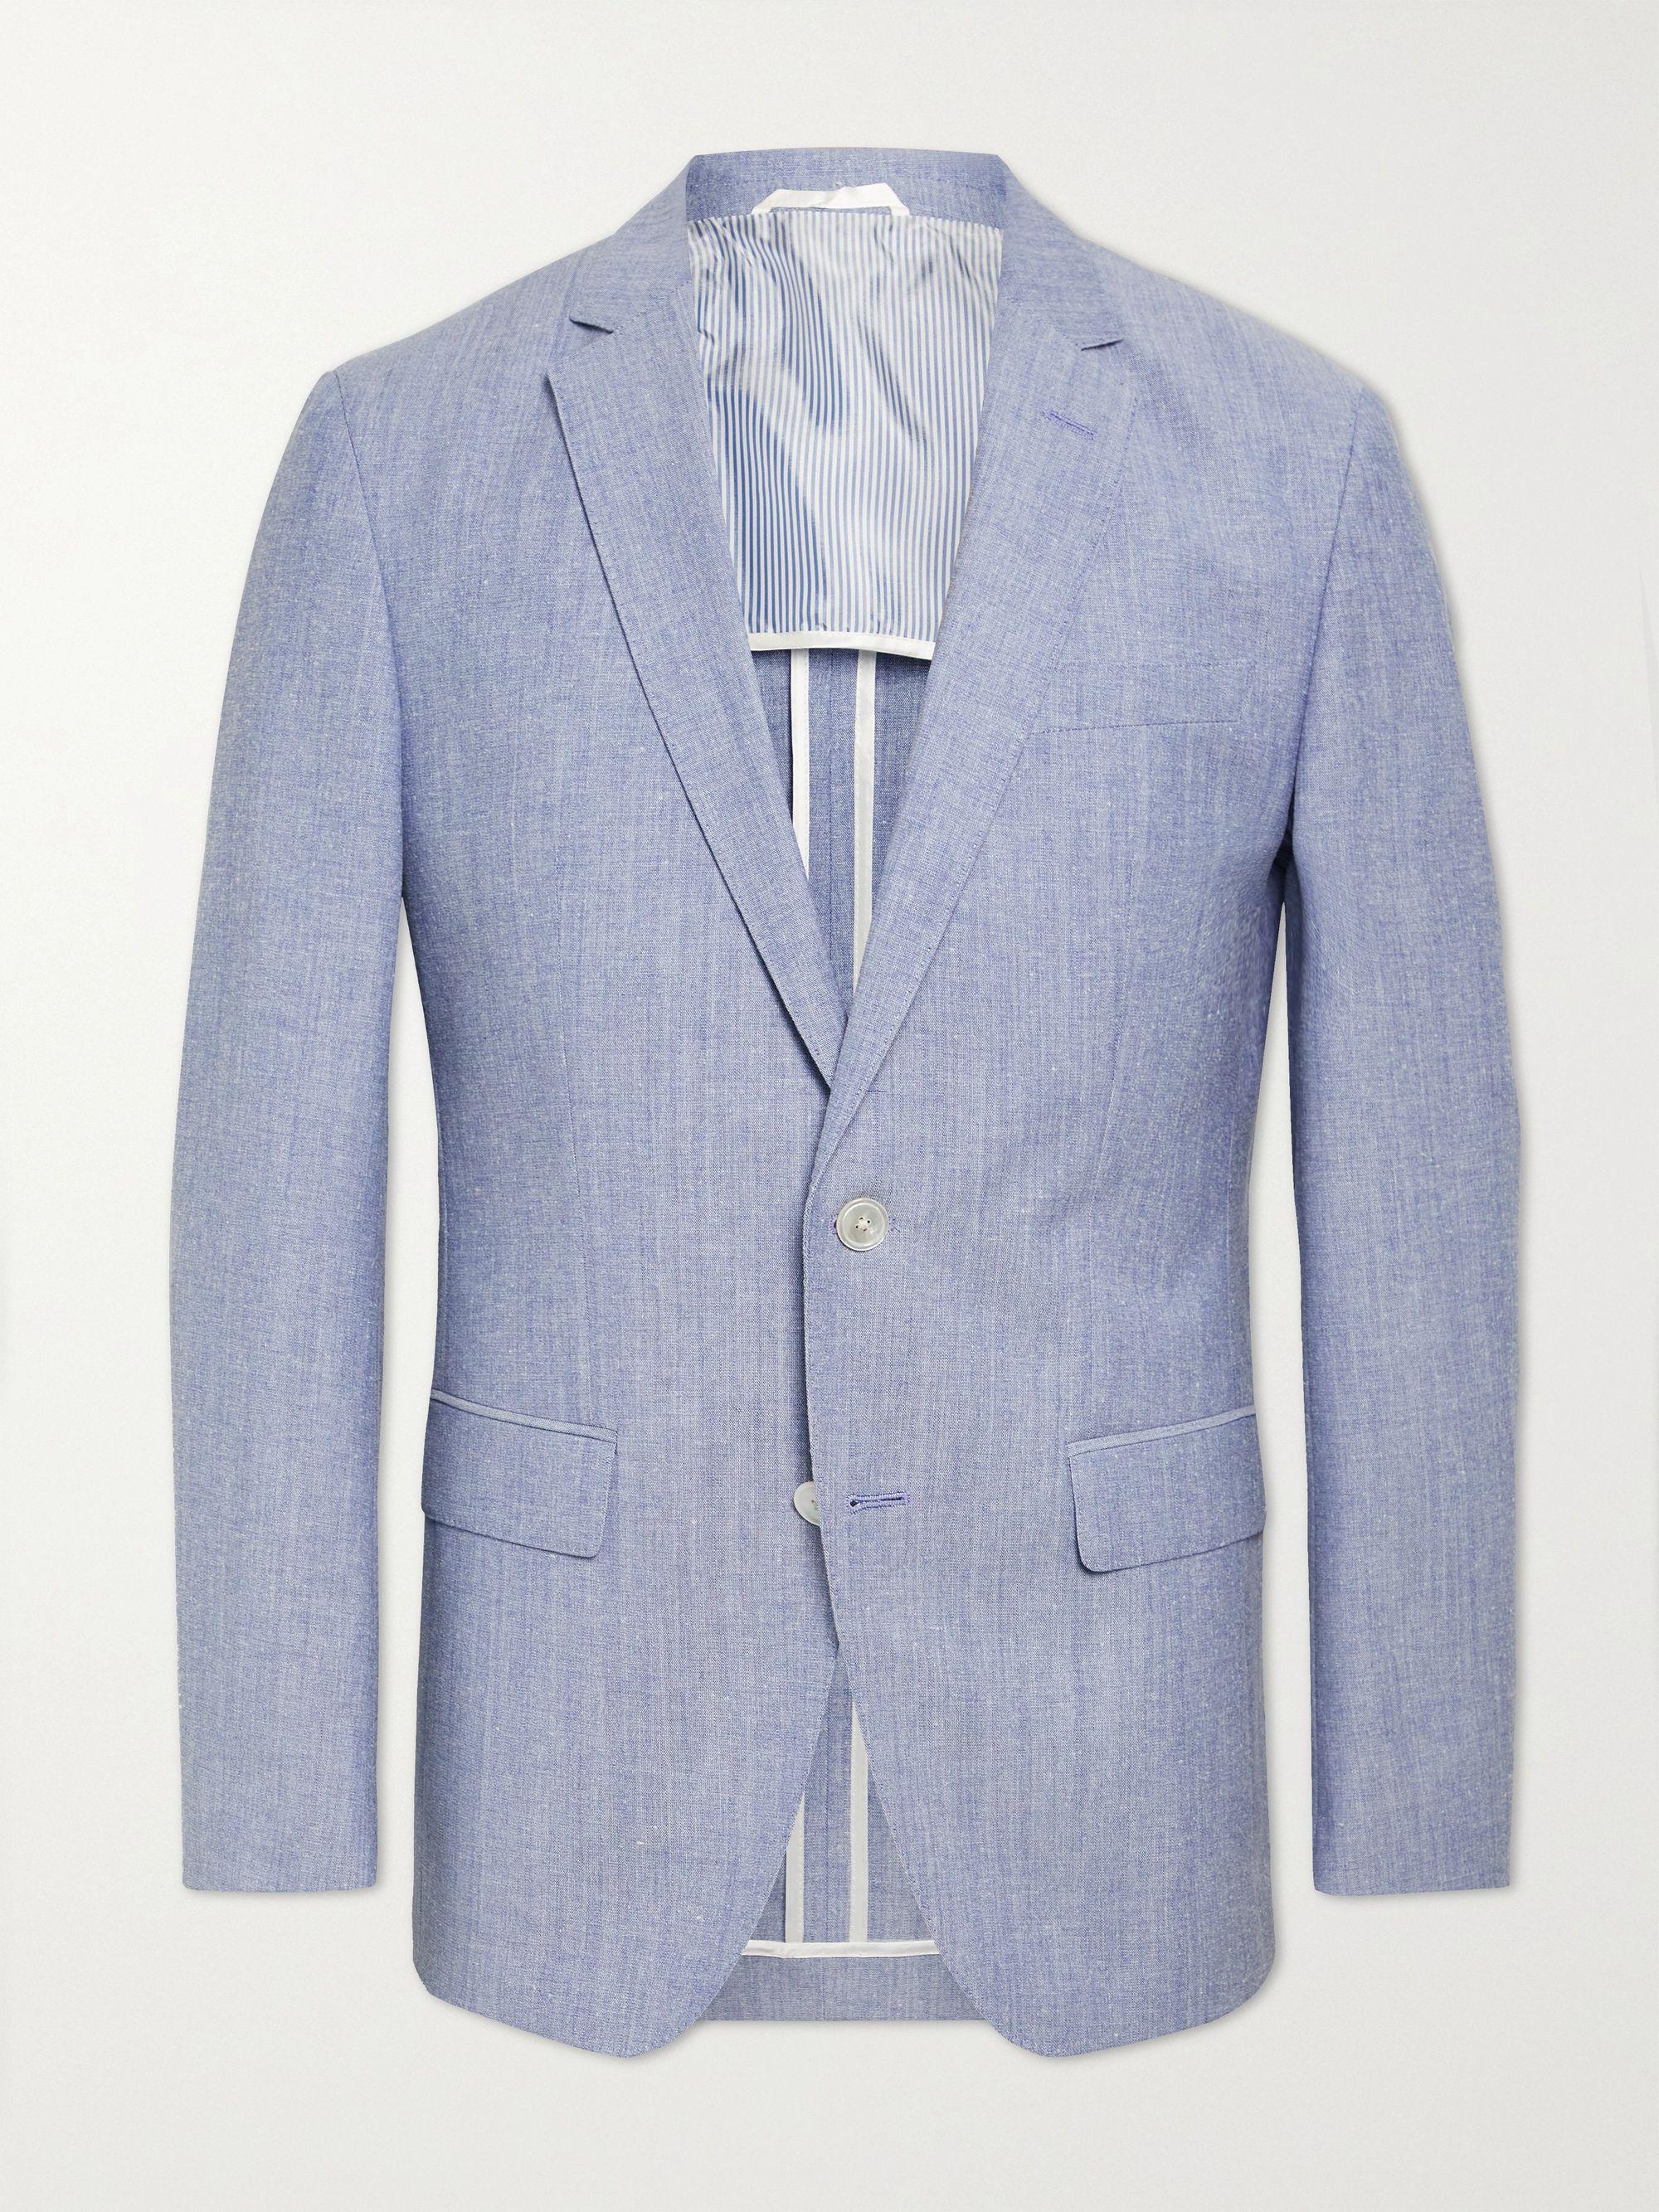 HUGO BOSS Hartlay2 Slim-Fit Melange Cotton and Virgin Wool-Blend Suit Jacket